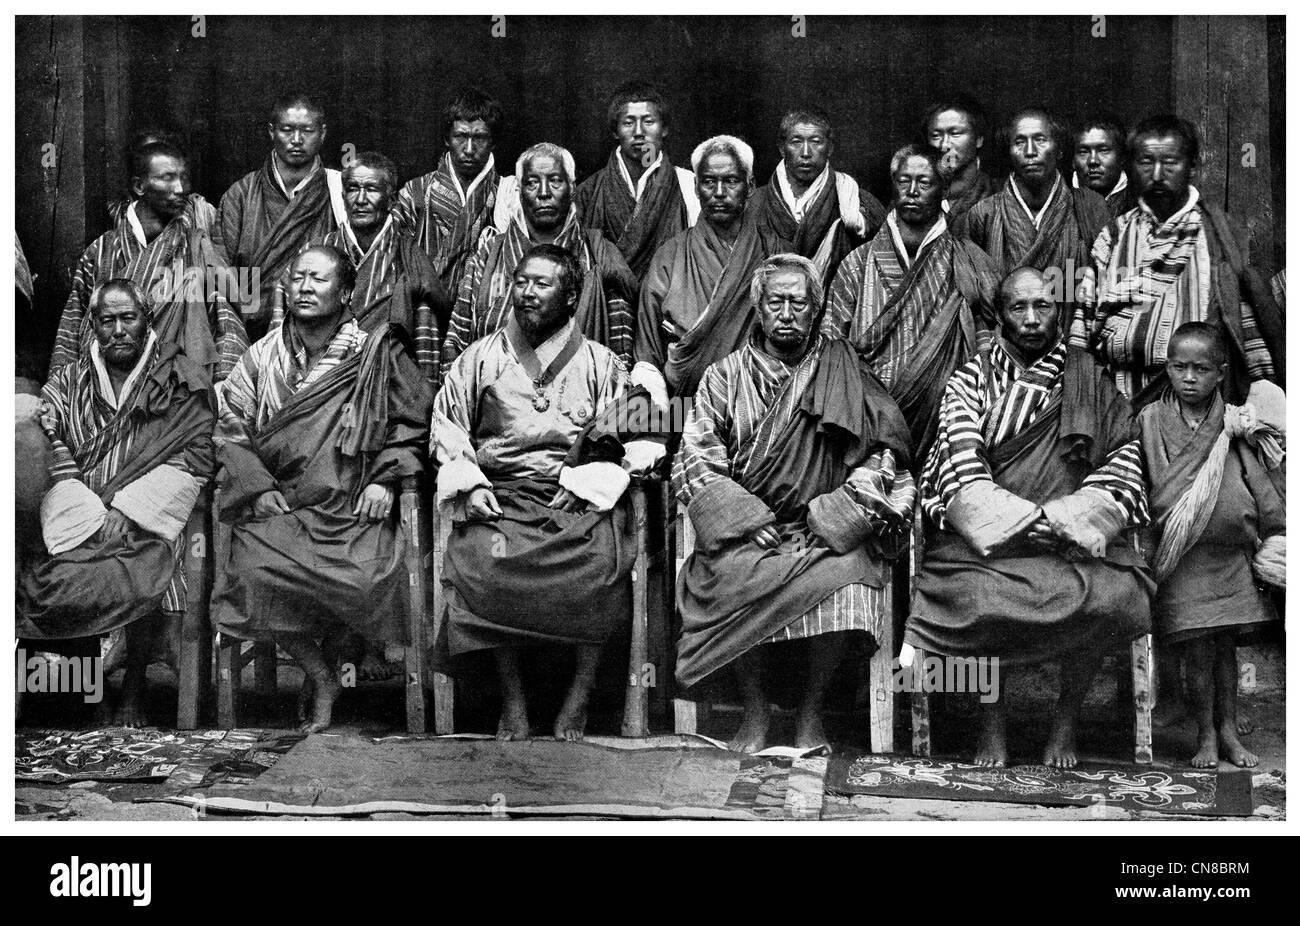 First published 1914  Sir Ugyen and council Poonakha Jongpen Thimbu Zung Donyer Deb Zimpon Ugen Dorji Bhutan king - Stock Image